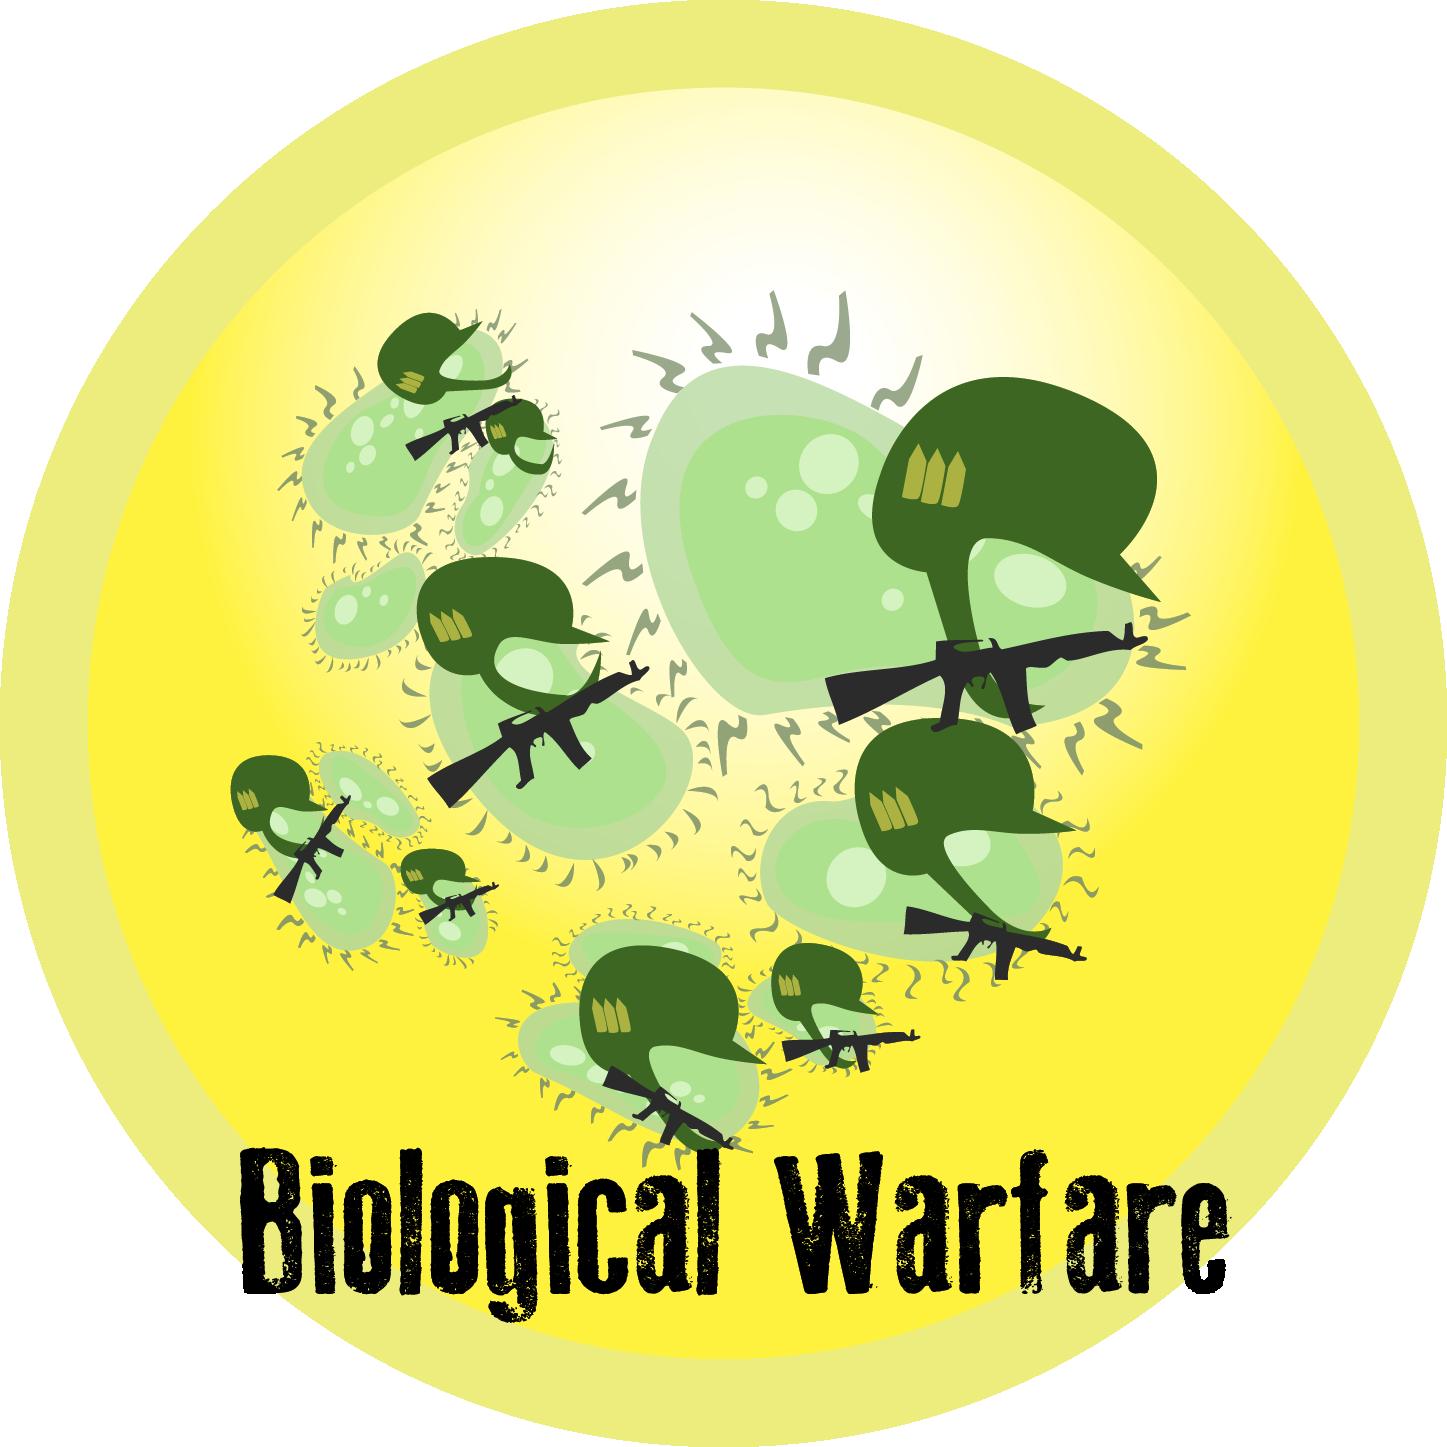 Biological warfare by katlyon on deviantart